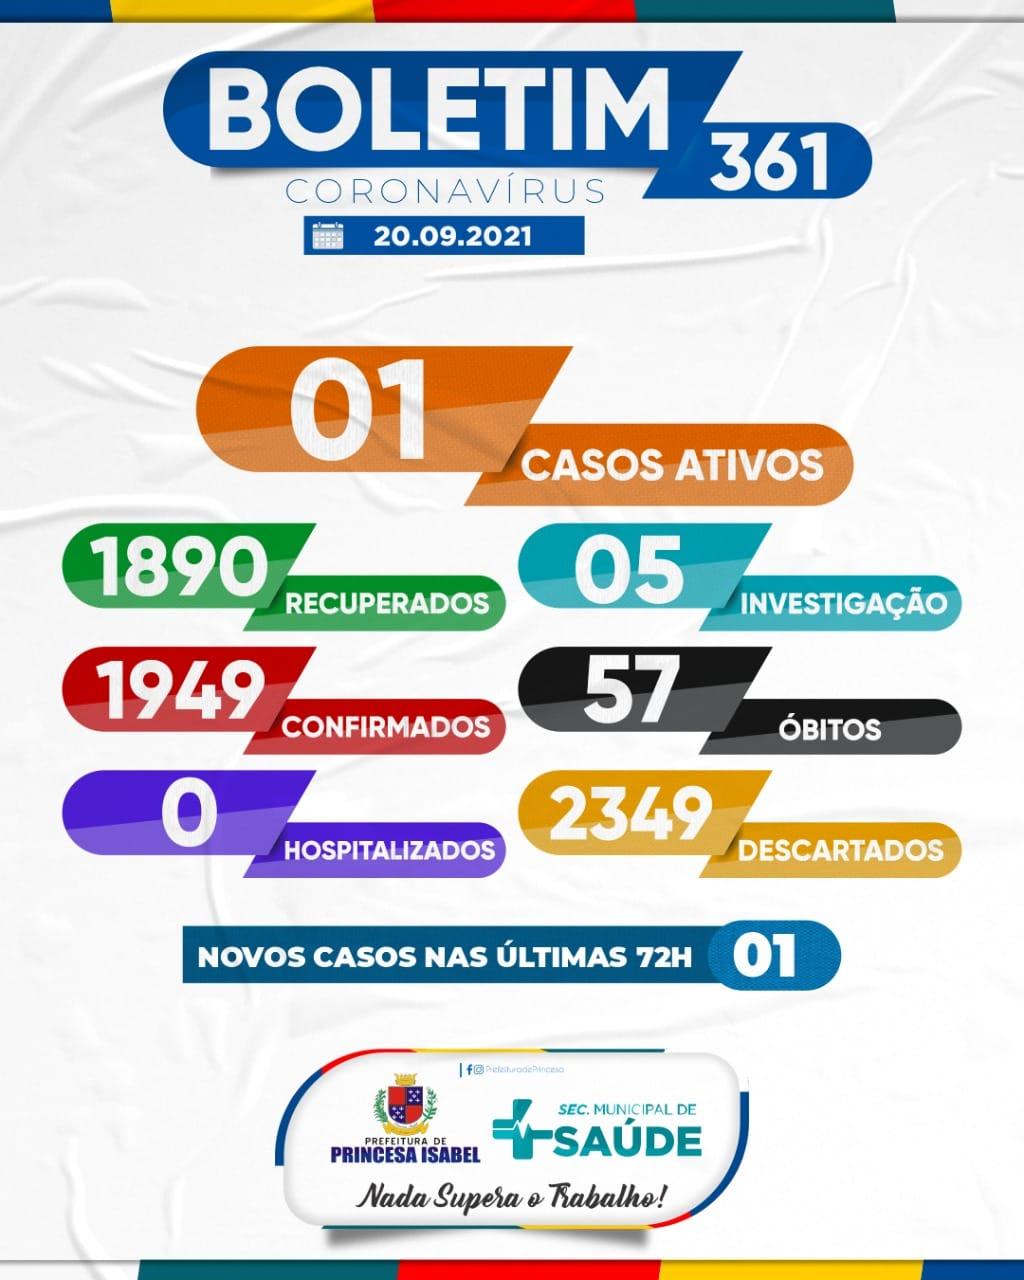 BOLETIM 361 - 20/09/2021